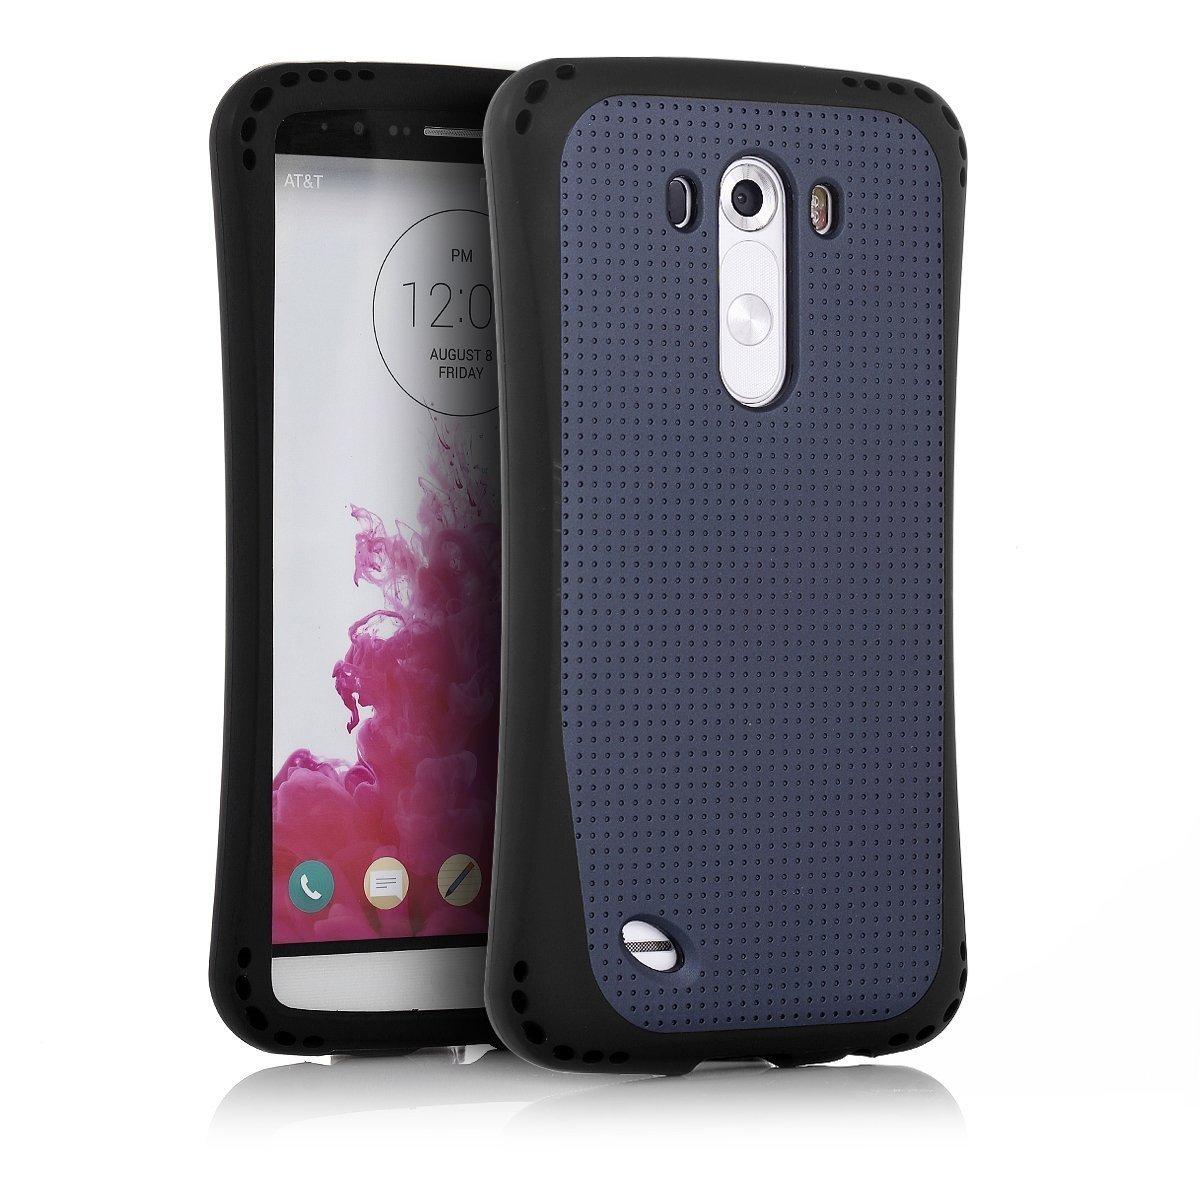 LG G3 Case, Easylife Anti-Slip Anti-shock Tough Armor Protective Case Cover for LG G3 (Black)